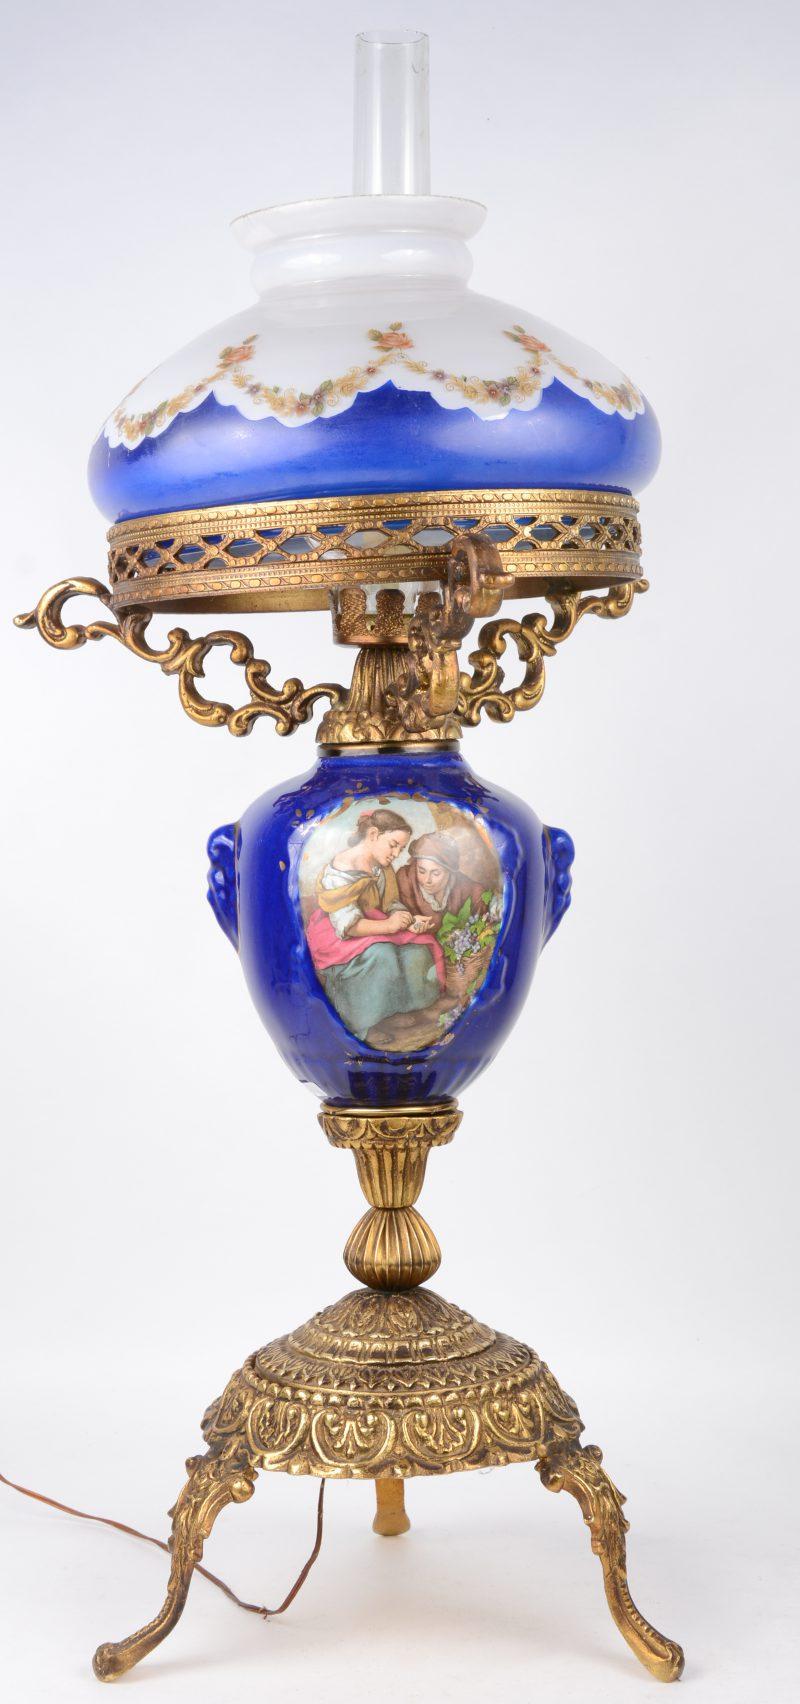 Een olielamp in polychroom porselein en messing. Omgevormd tot lamp. Met coupe van melkglas.